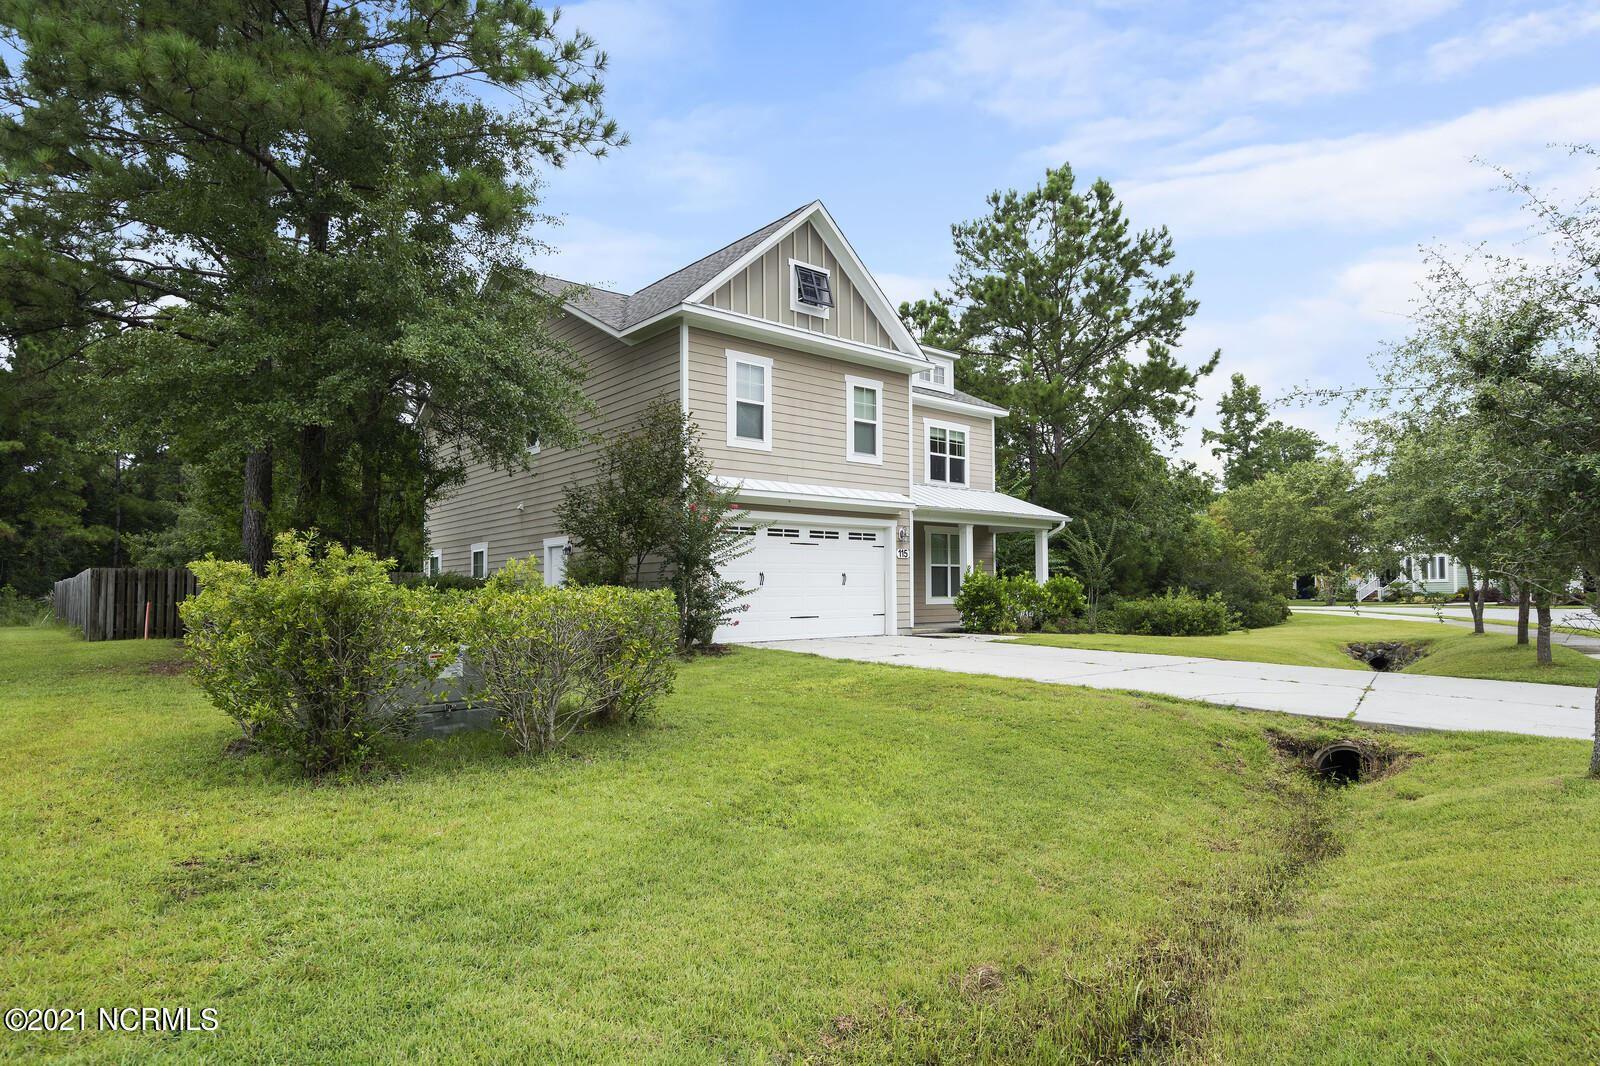 Photo of 115 Saltwater Landing Drive, Hampstead, NC 28443 (MLS # 100285457)